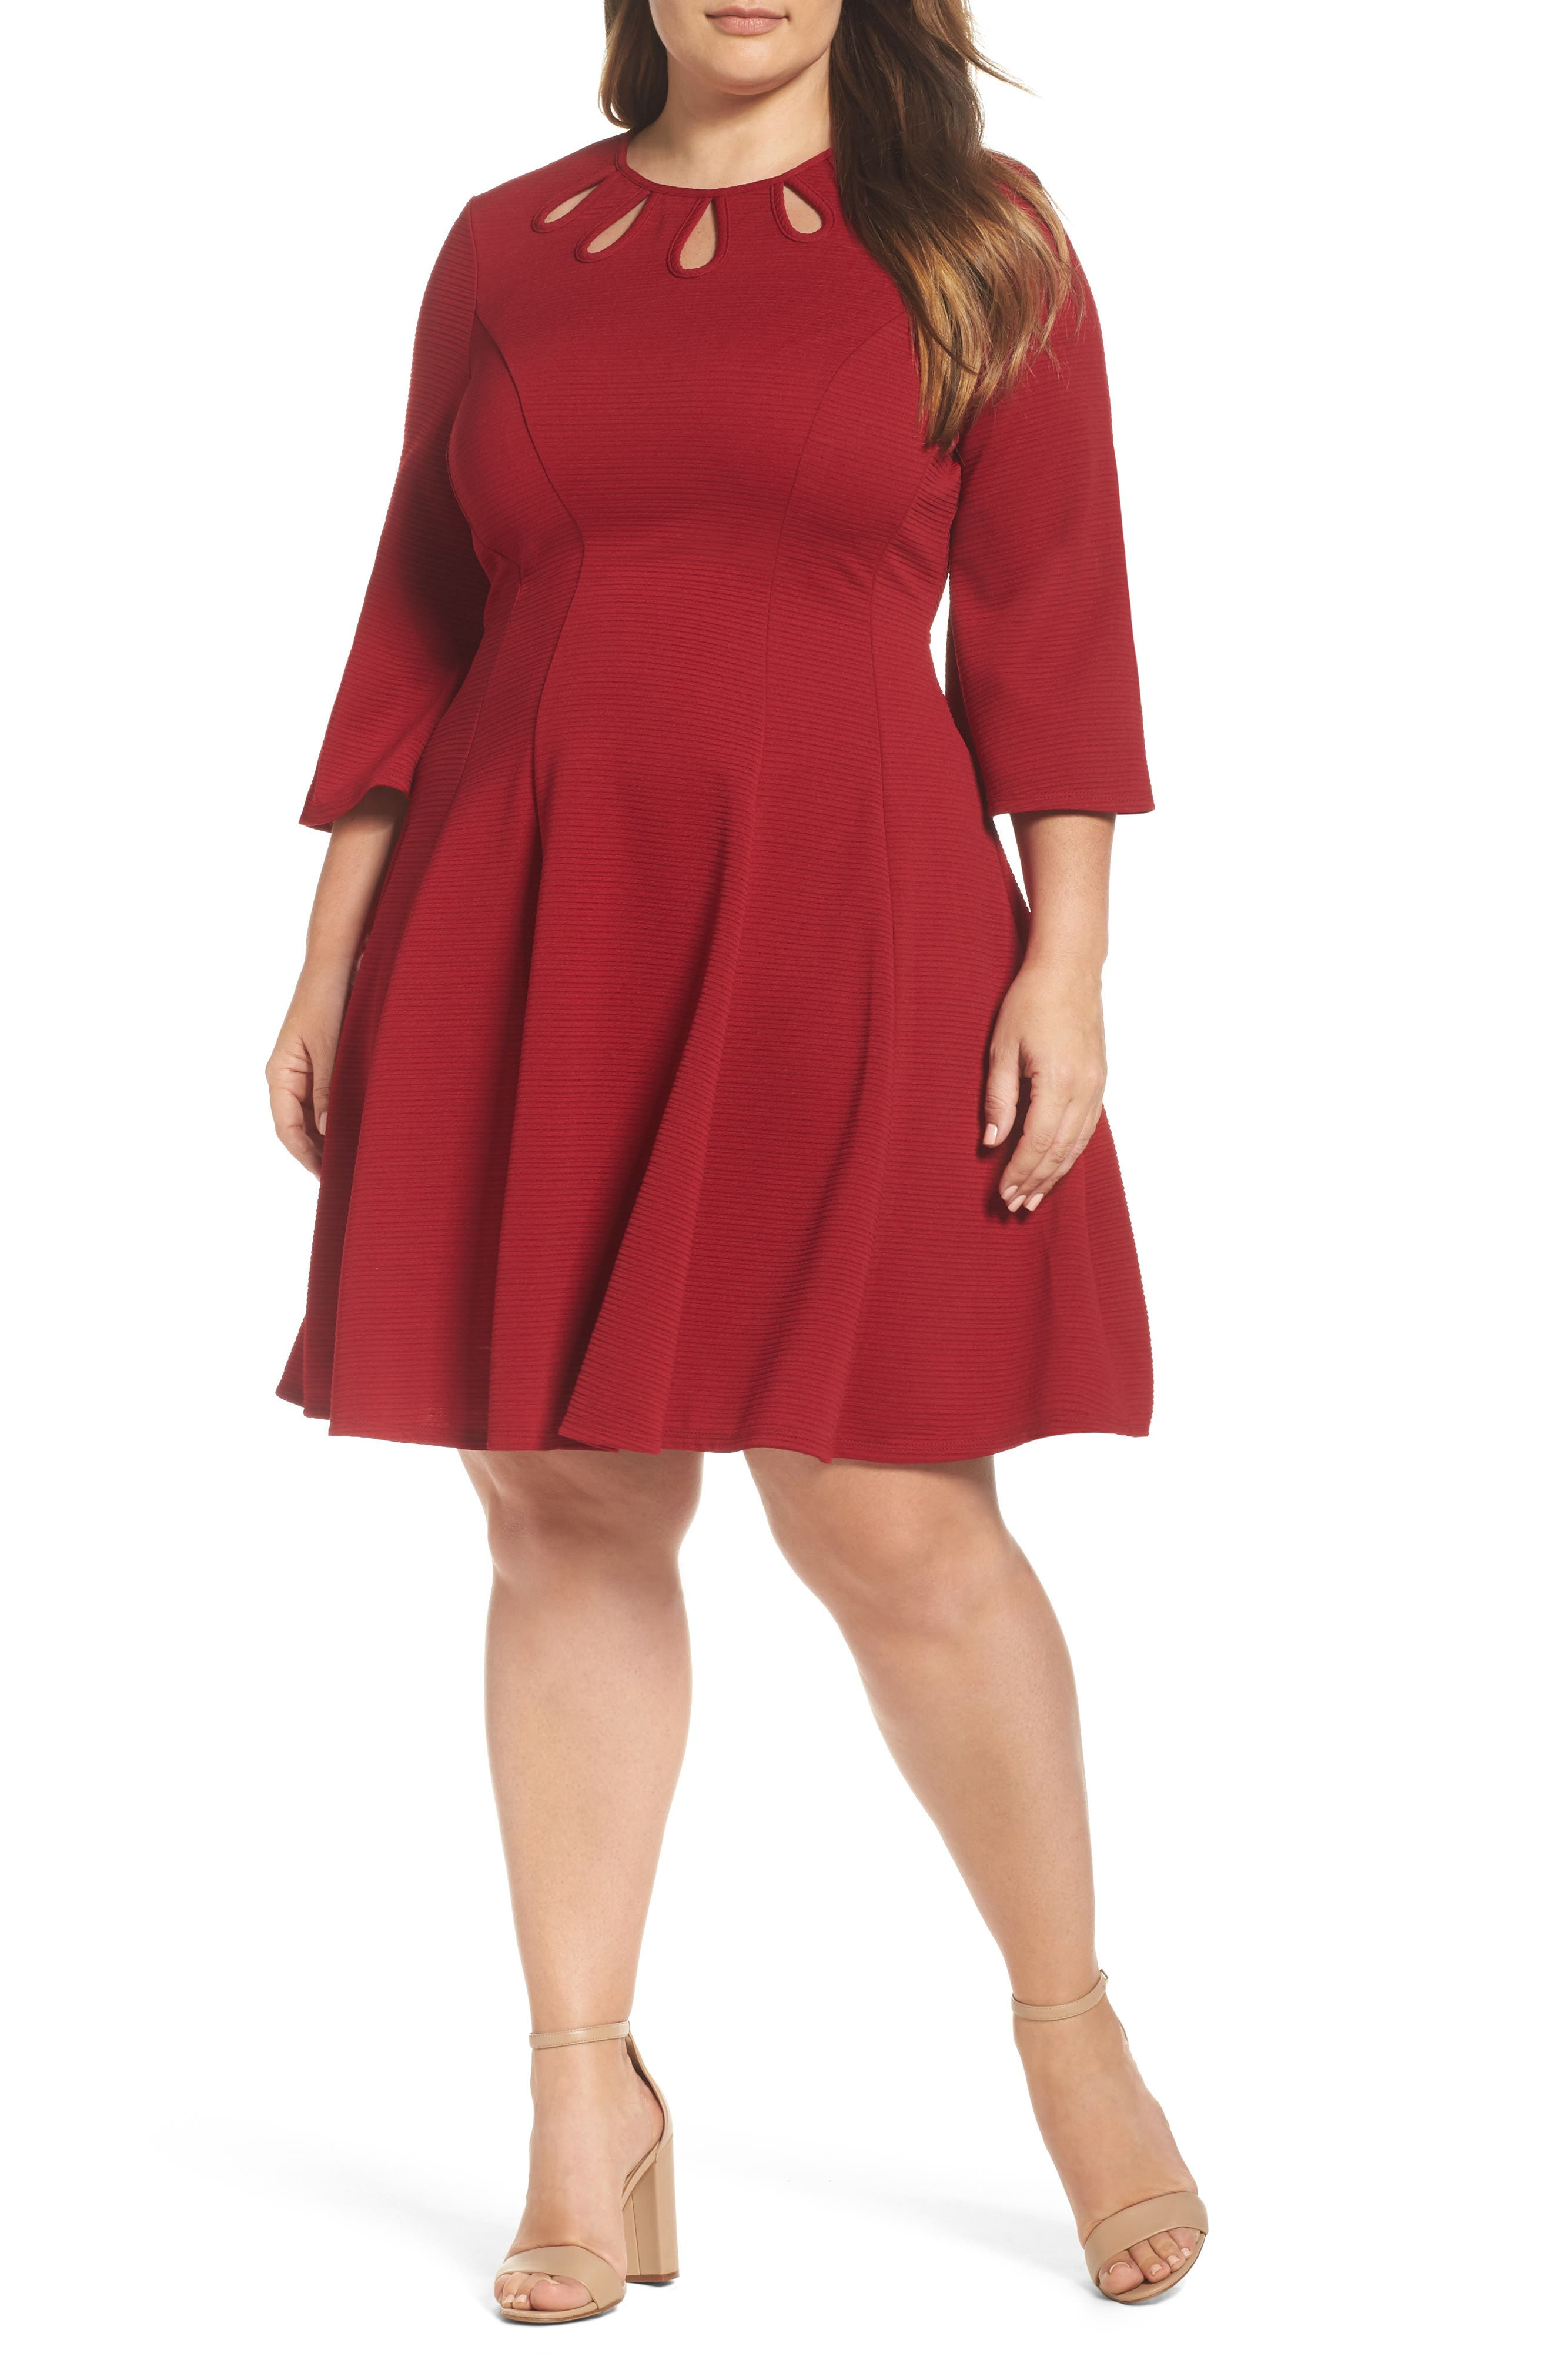 Gabby Skye Keyhole Neck Ottoman Fit & Flare Dress (Plus Size)